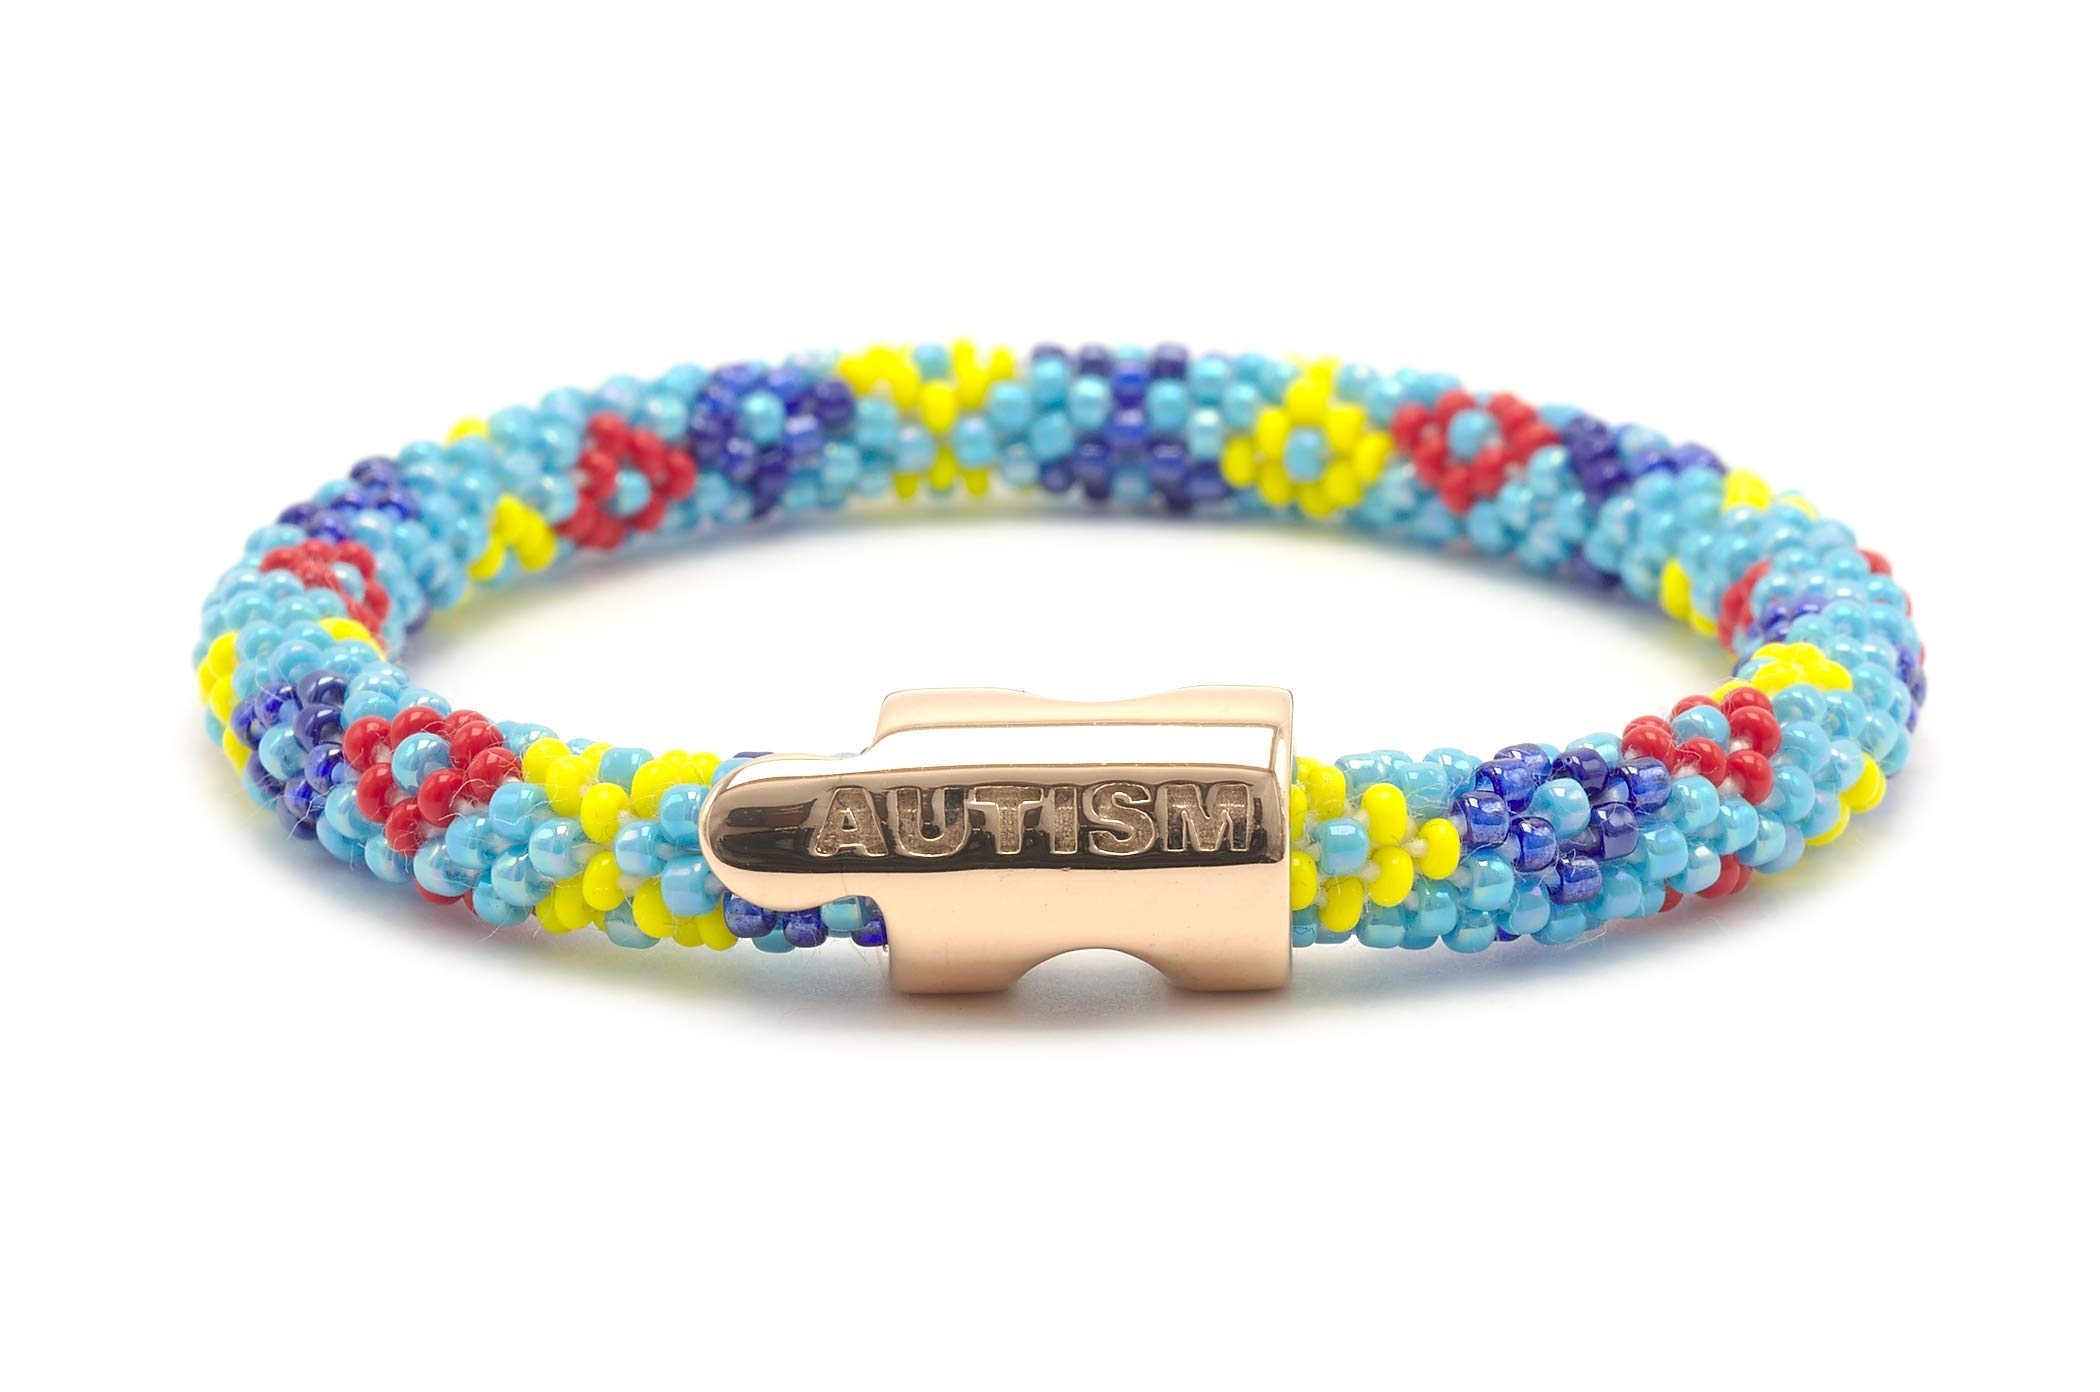 Sashka Co. Autism Charm Bracelet